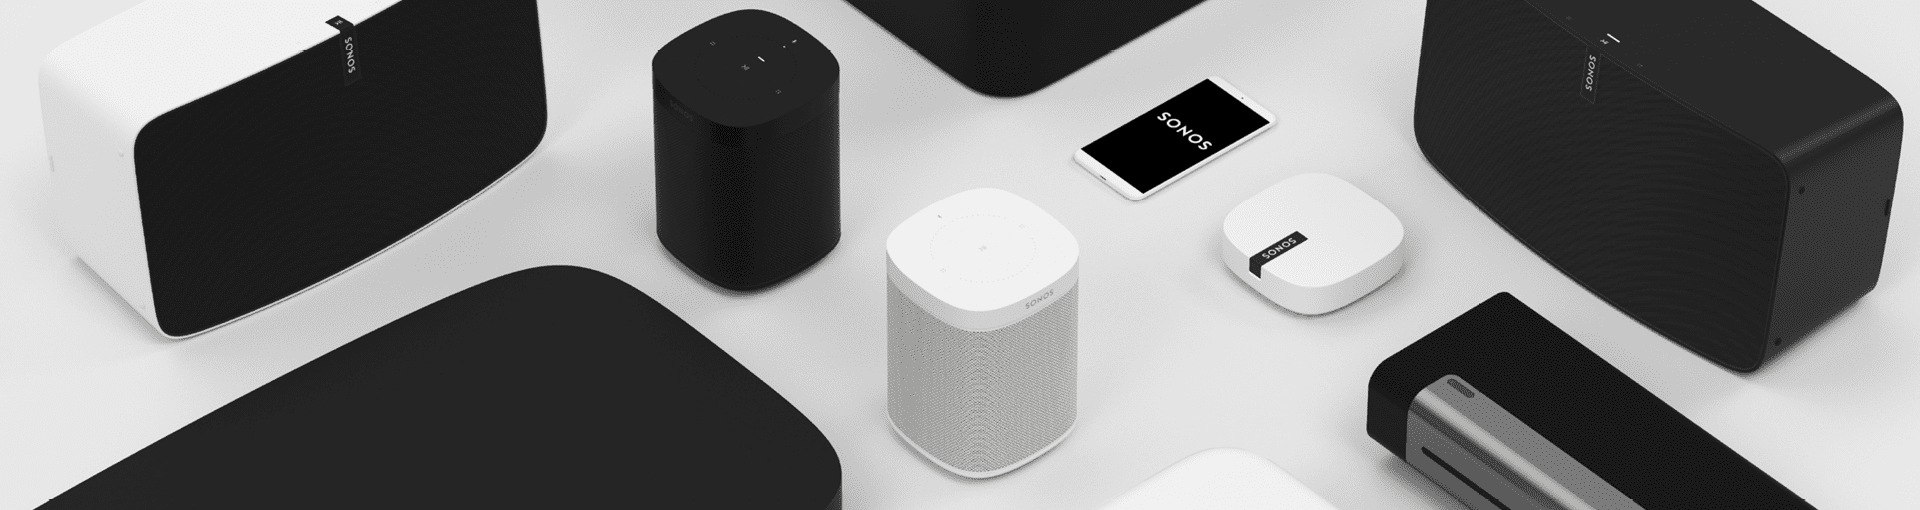 Beschallung Sonos